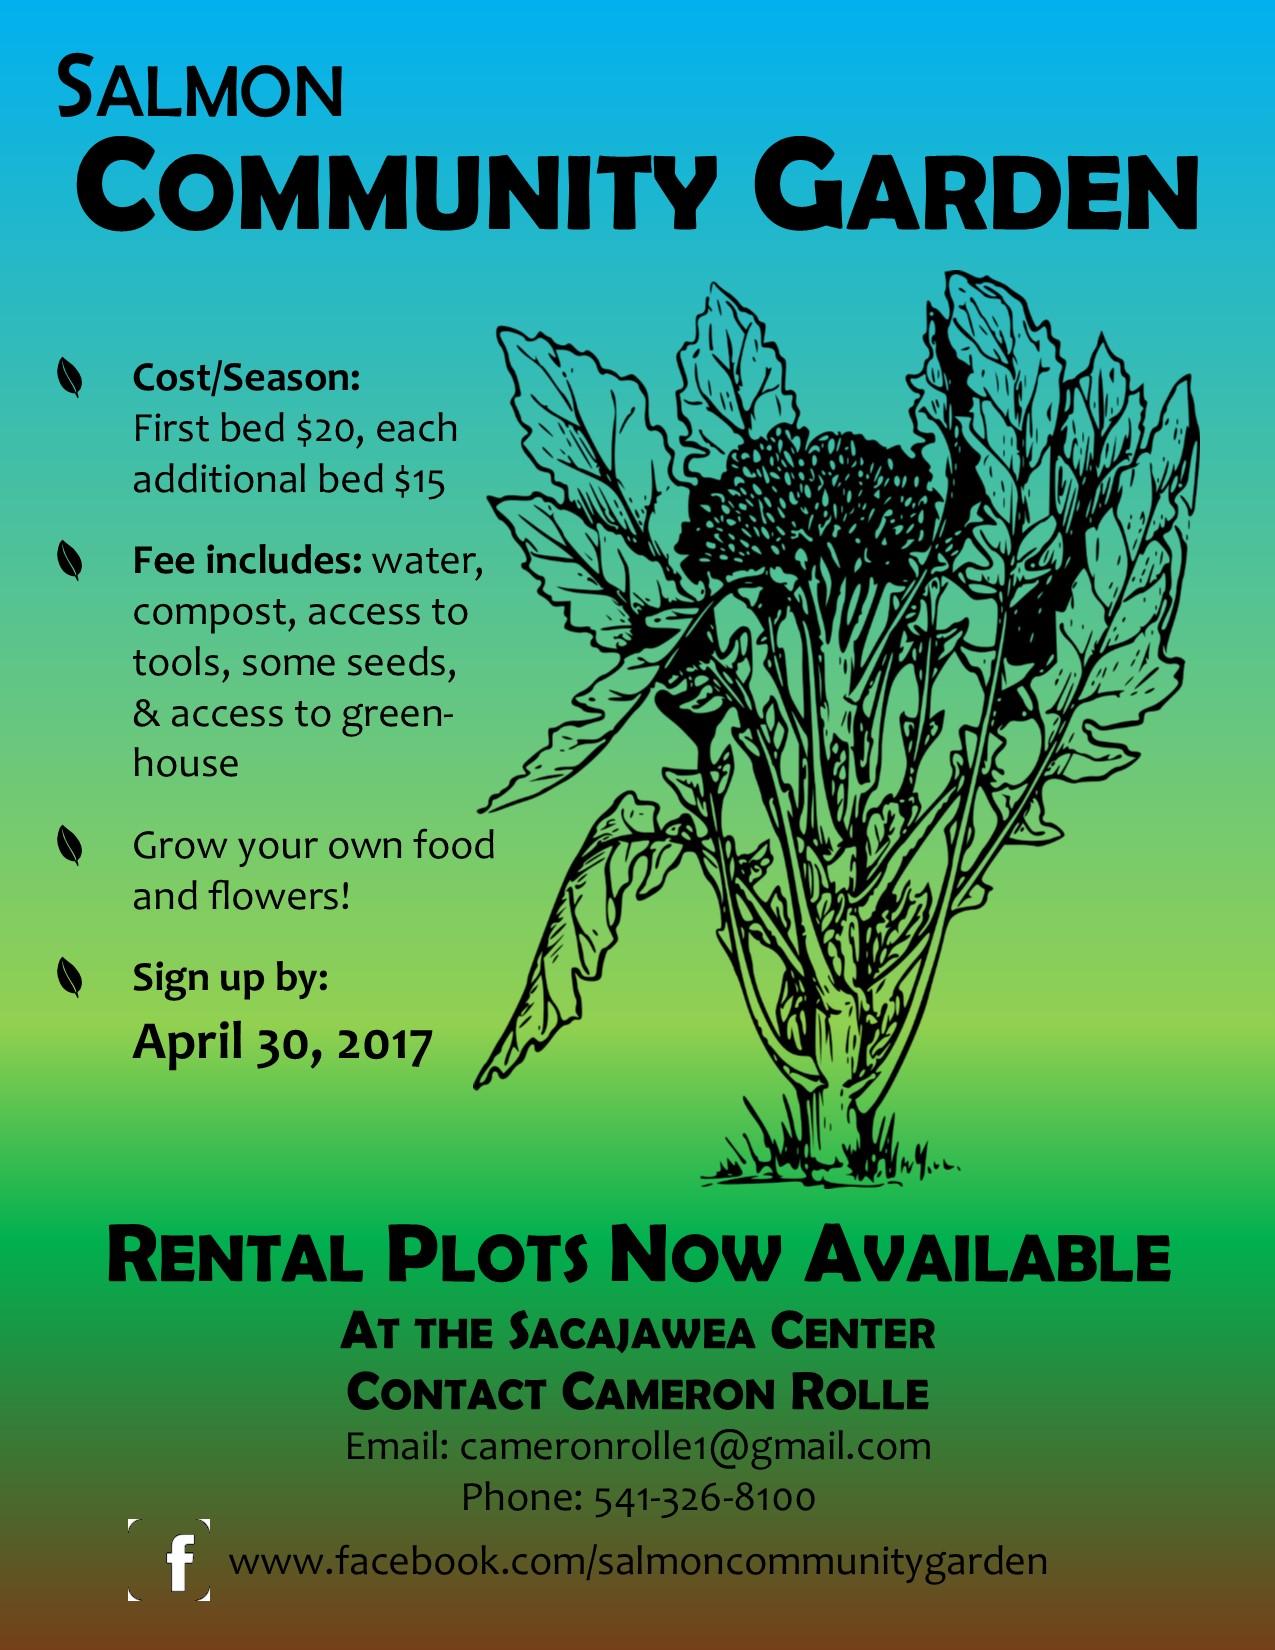 Salmon Community Garden